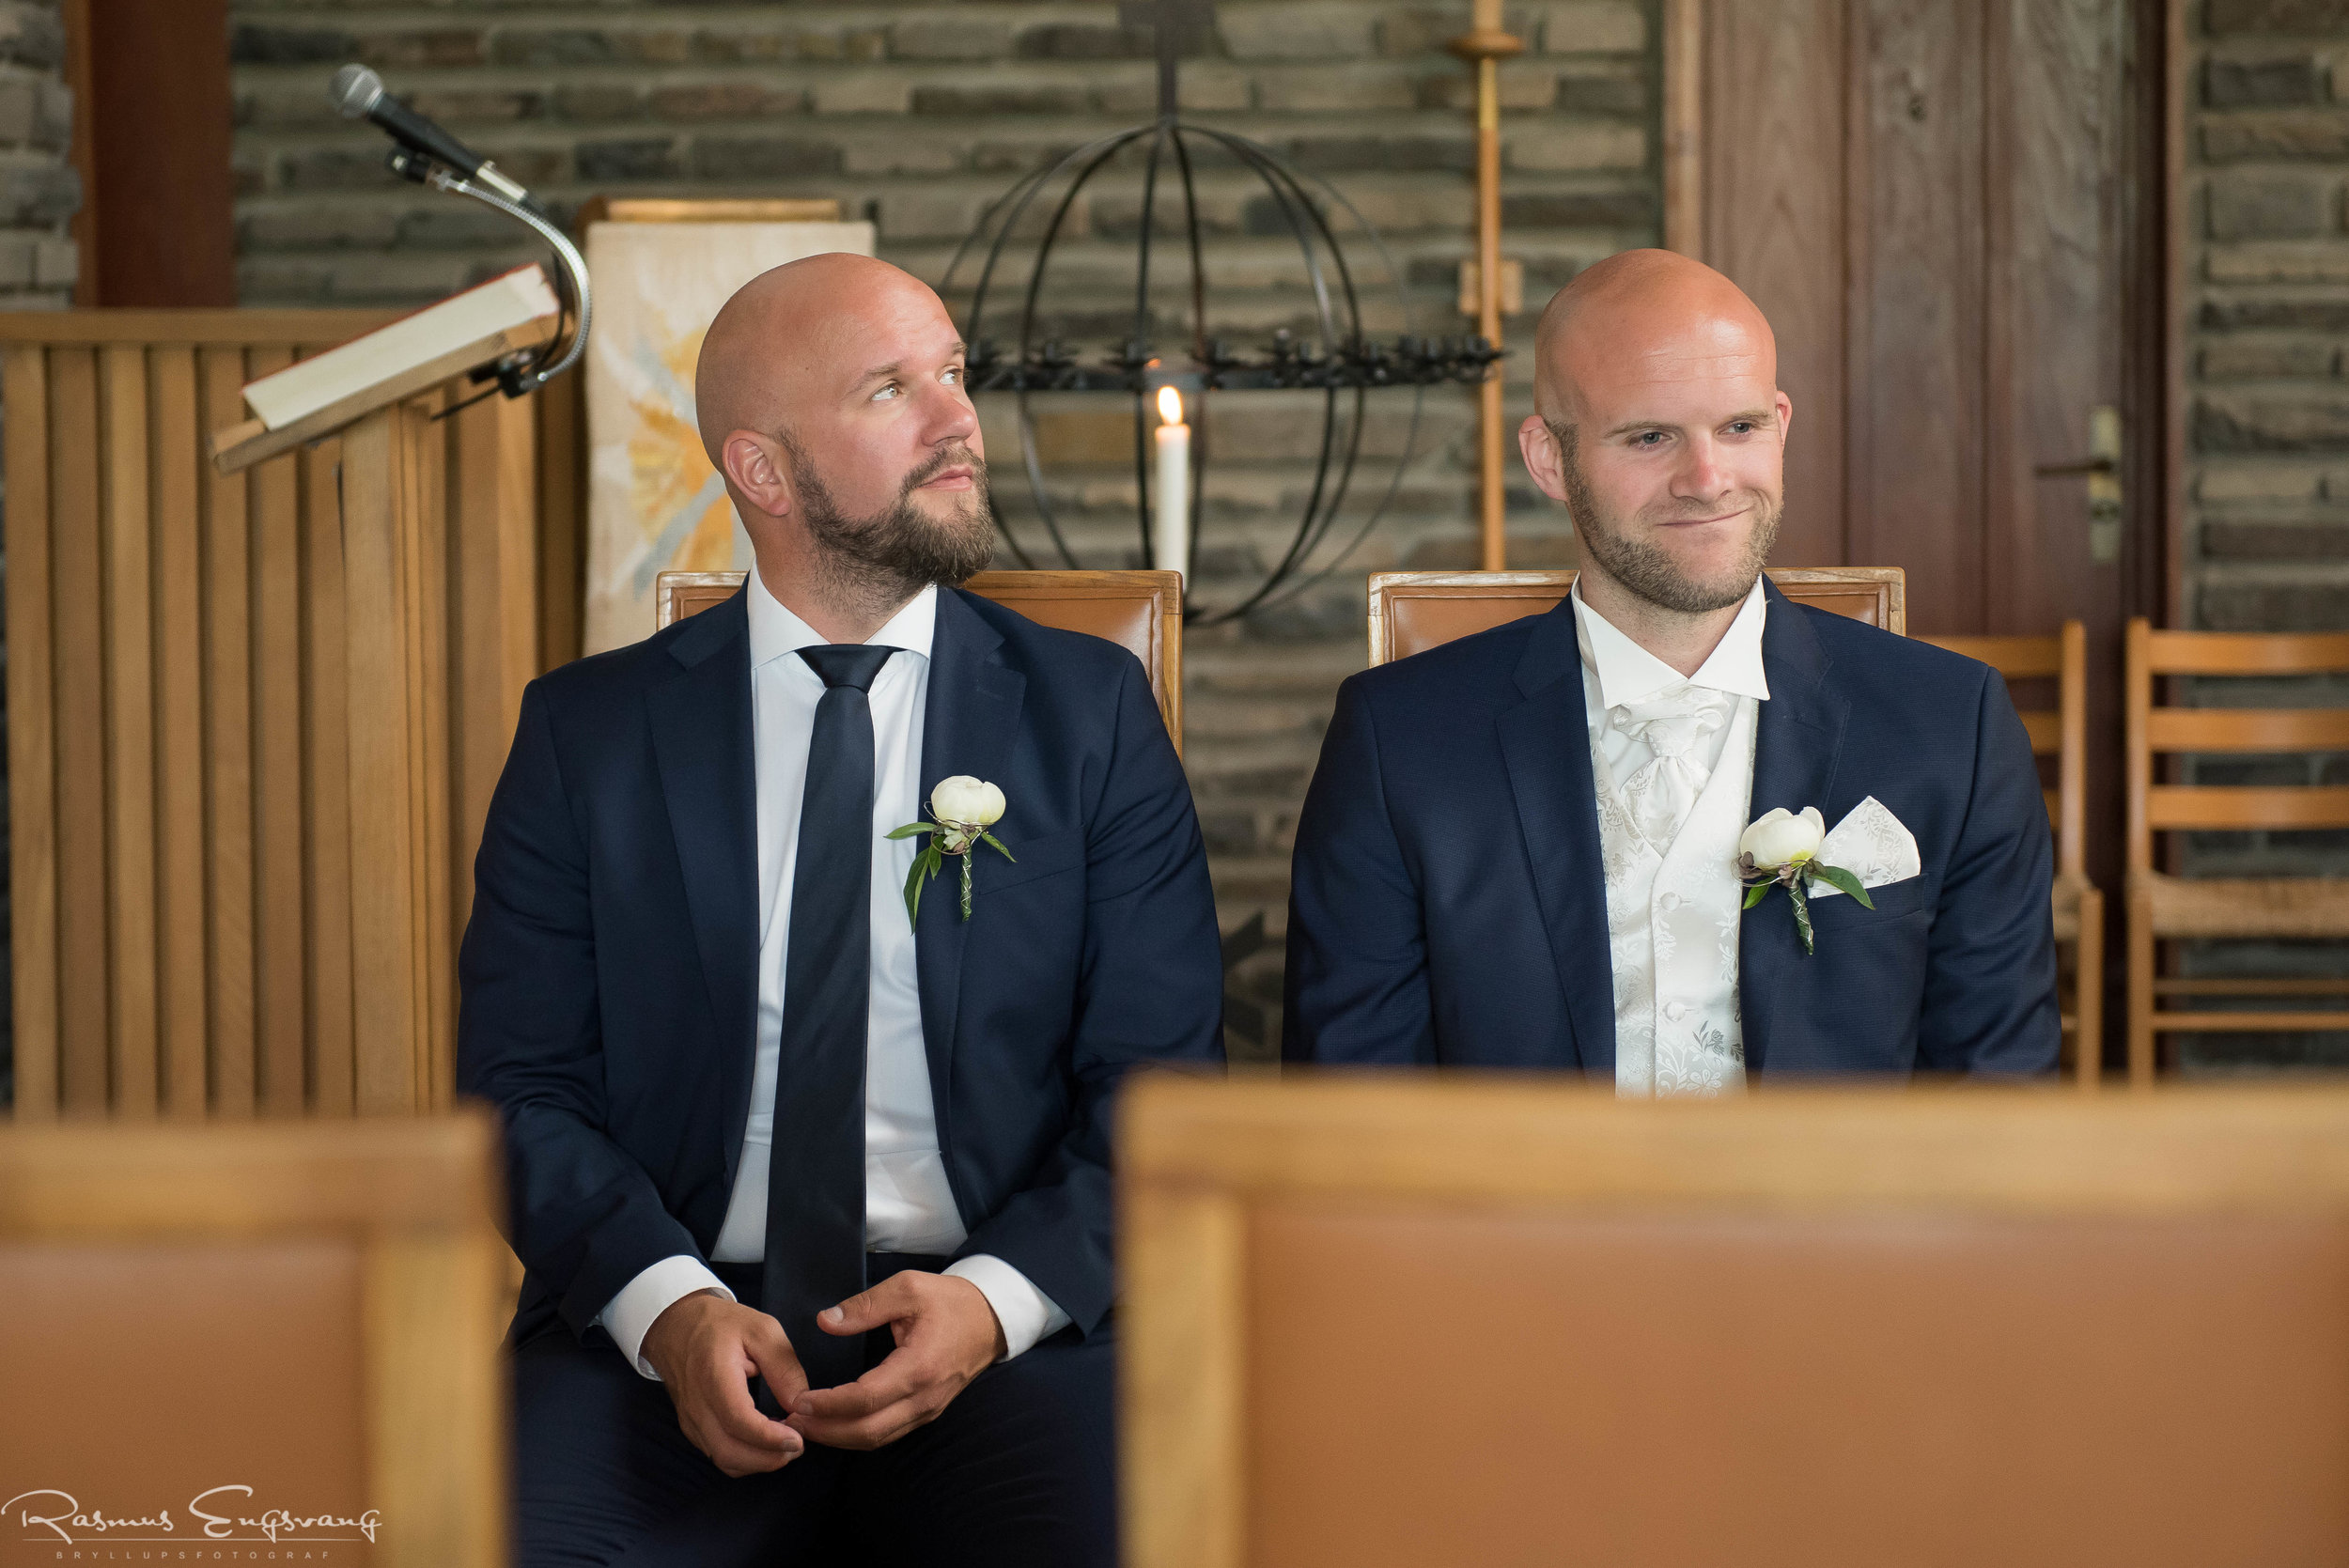 Bryllupsfotograf-København_Sjømannskirken_Fetch-205.jpg